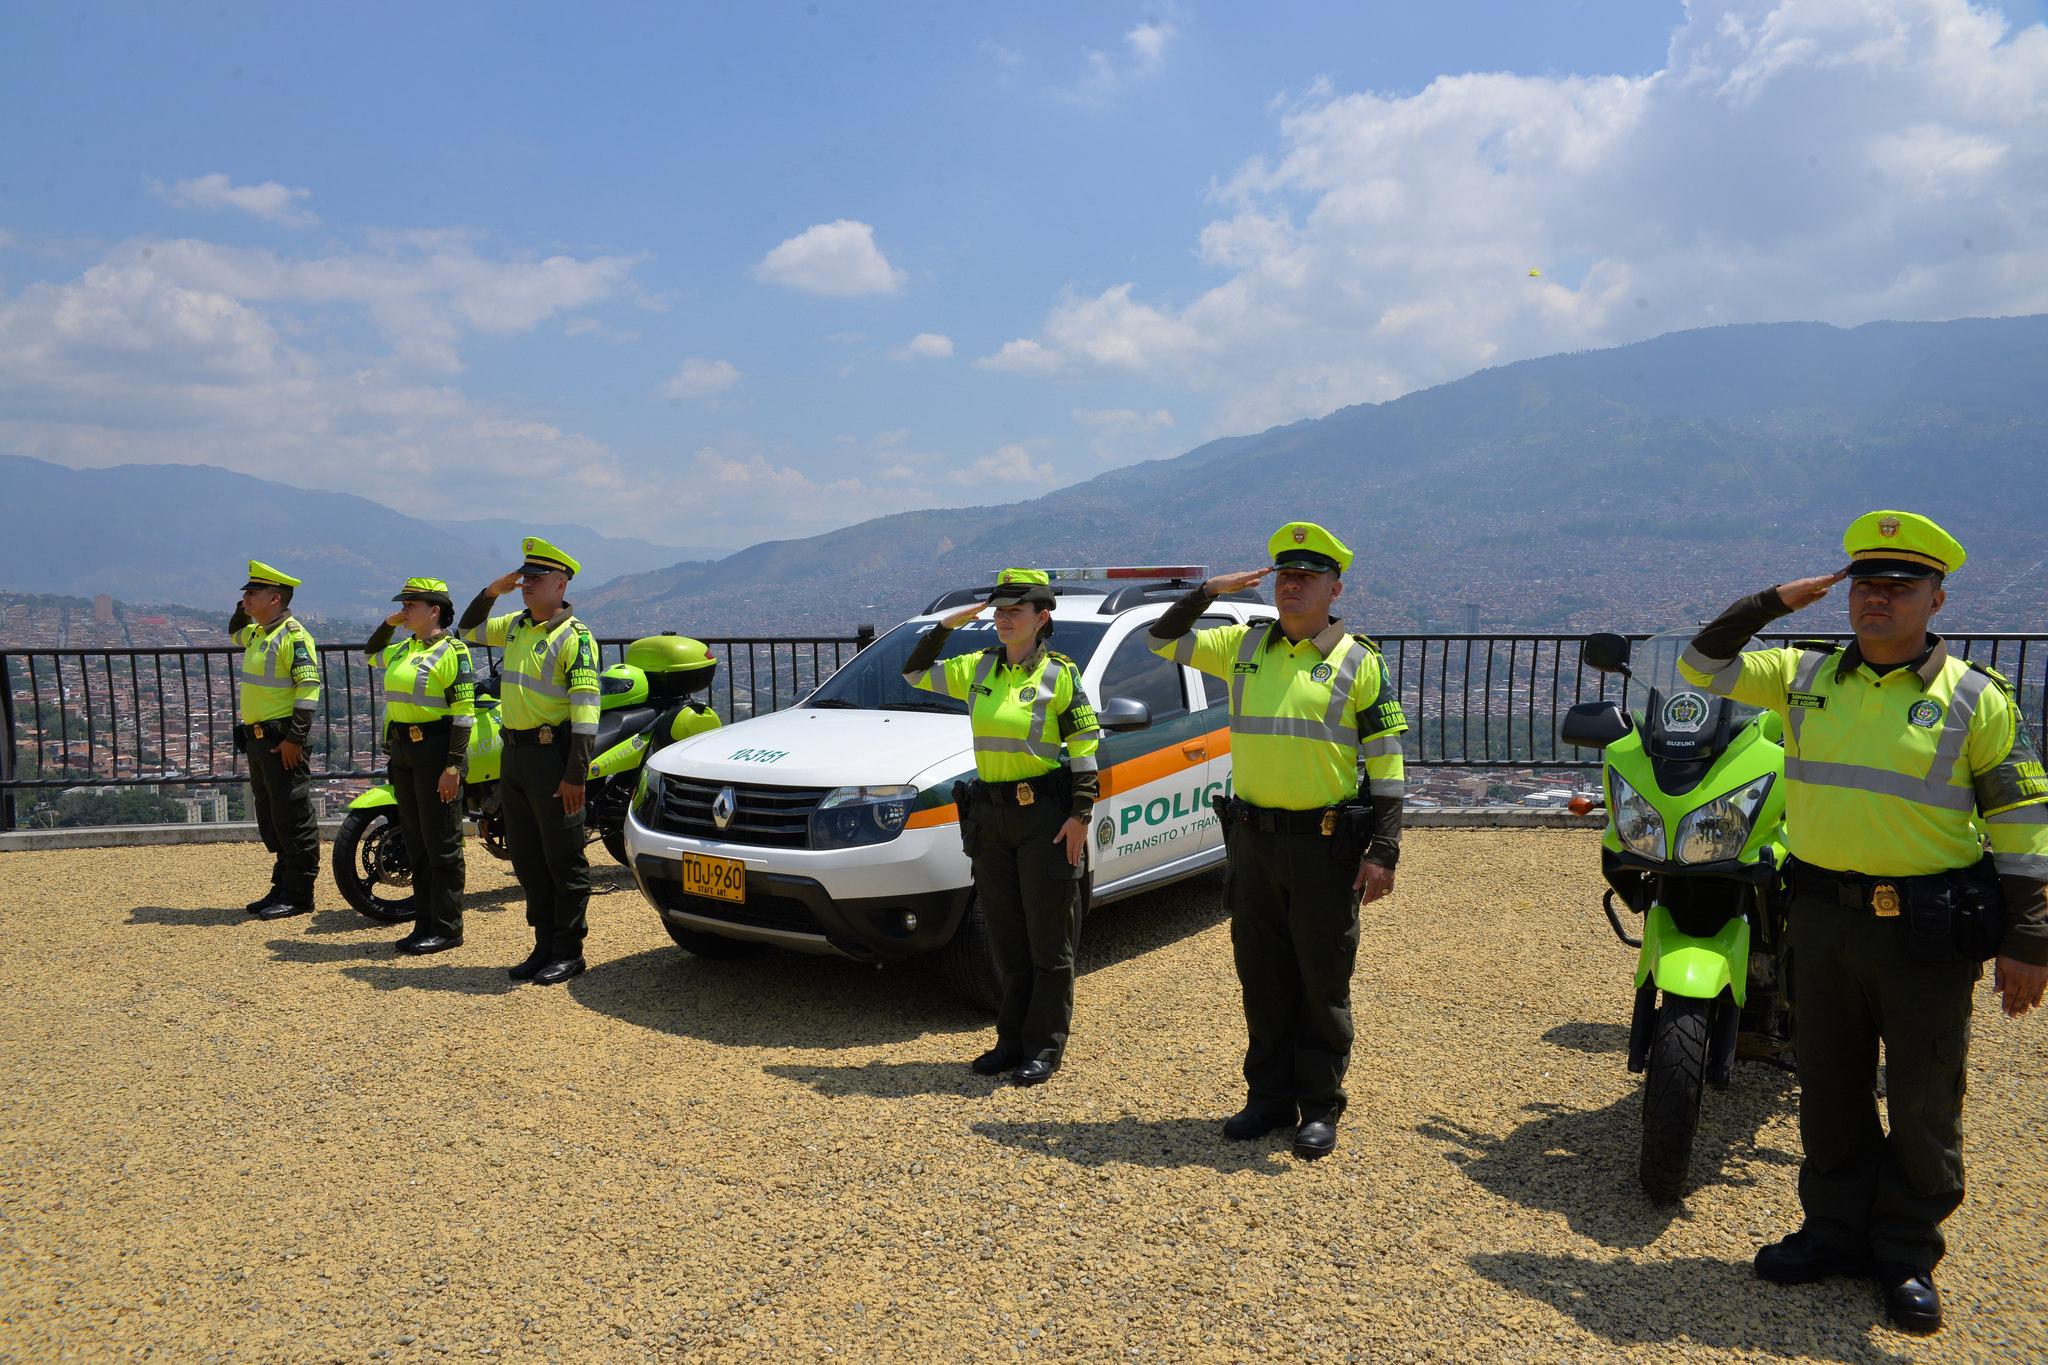 Transito y transporte polic a nacional for Oficina policia nacional